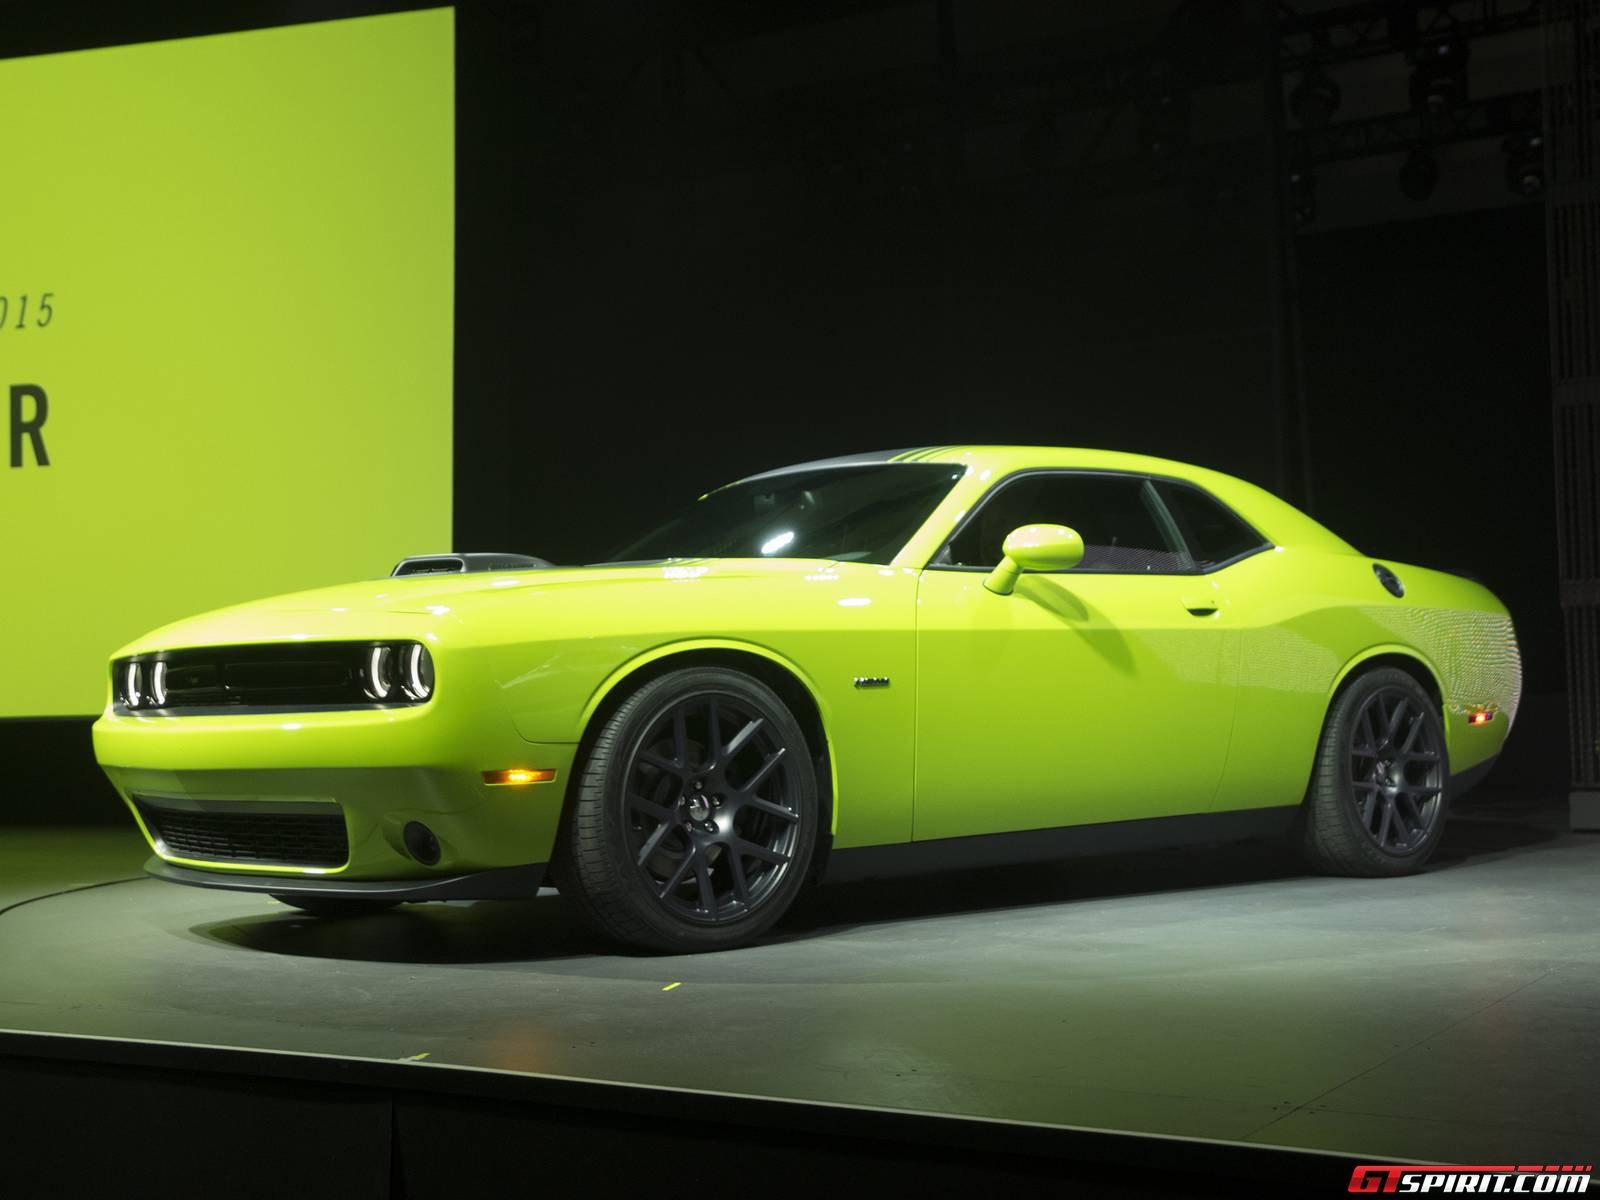 New Dodge Challenger >> New York 2014 Dodge Challenger Gtspirit